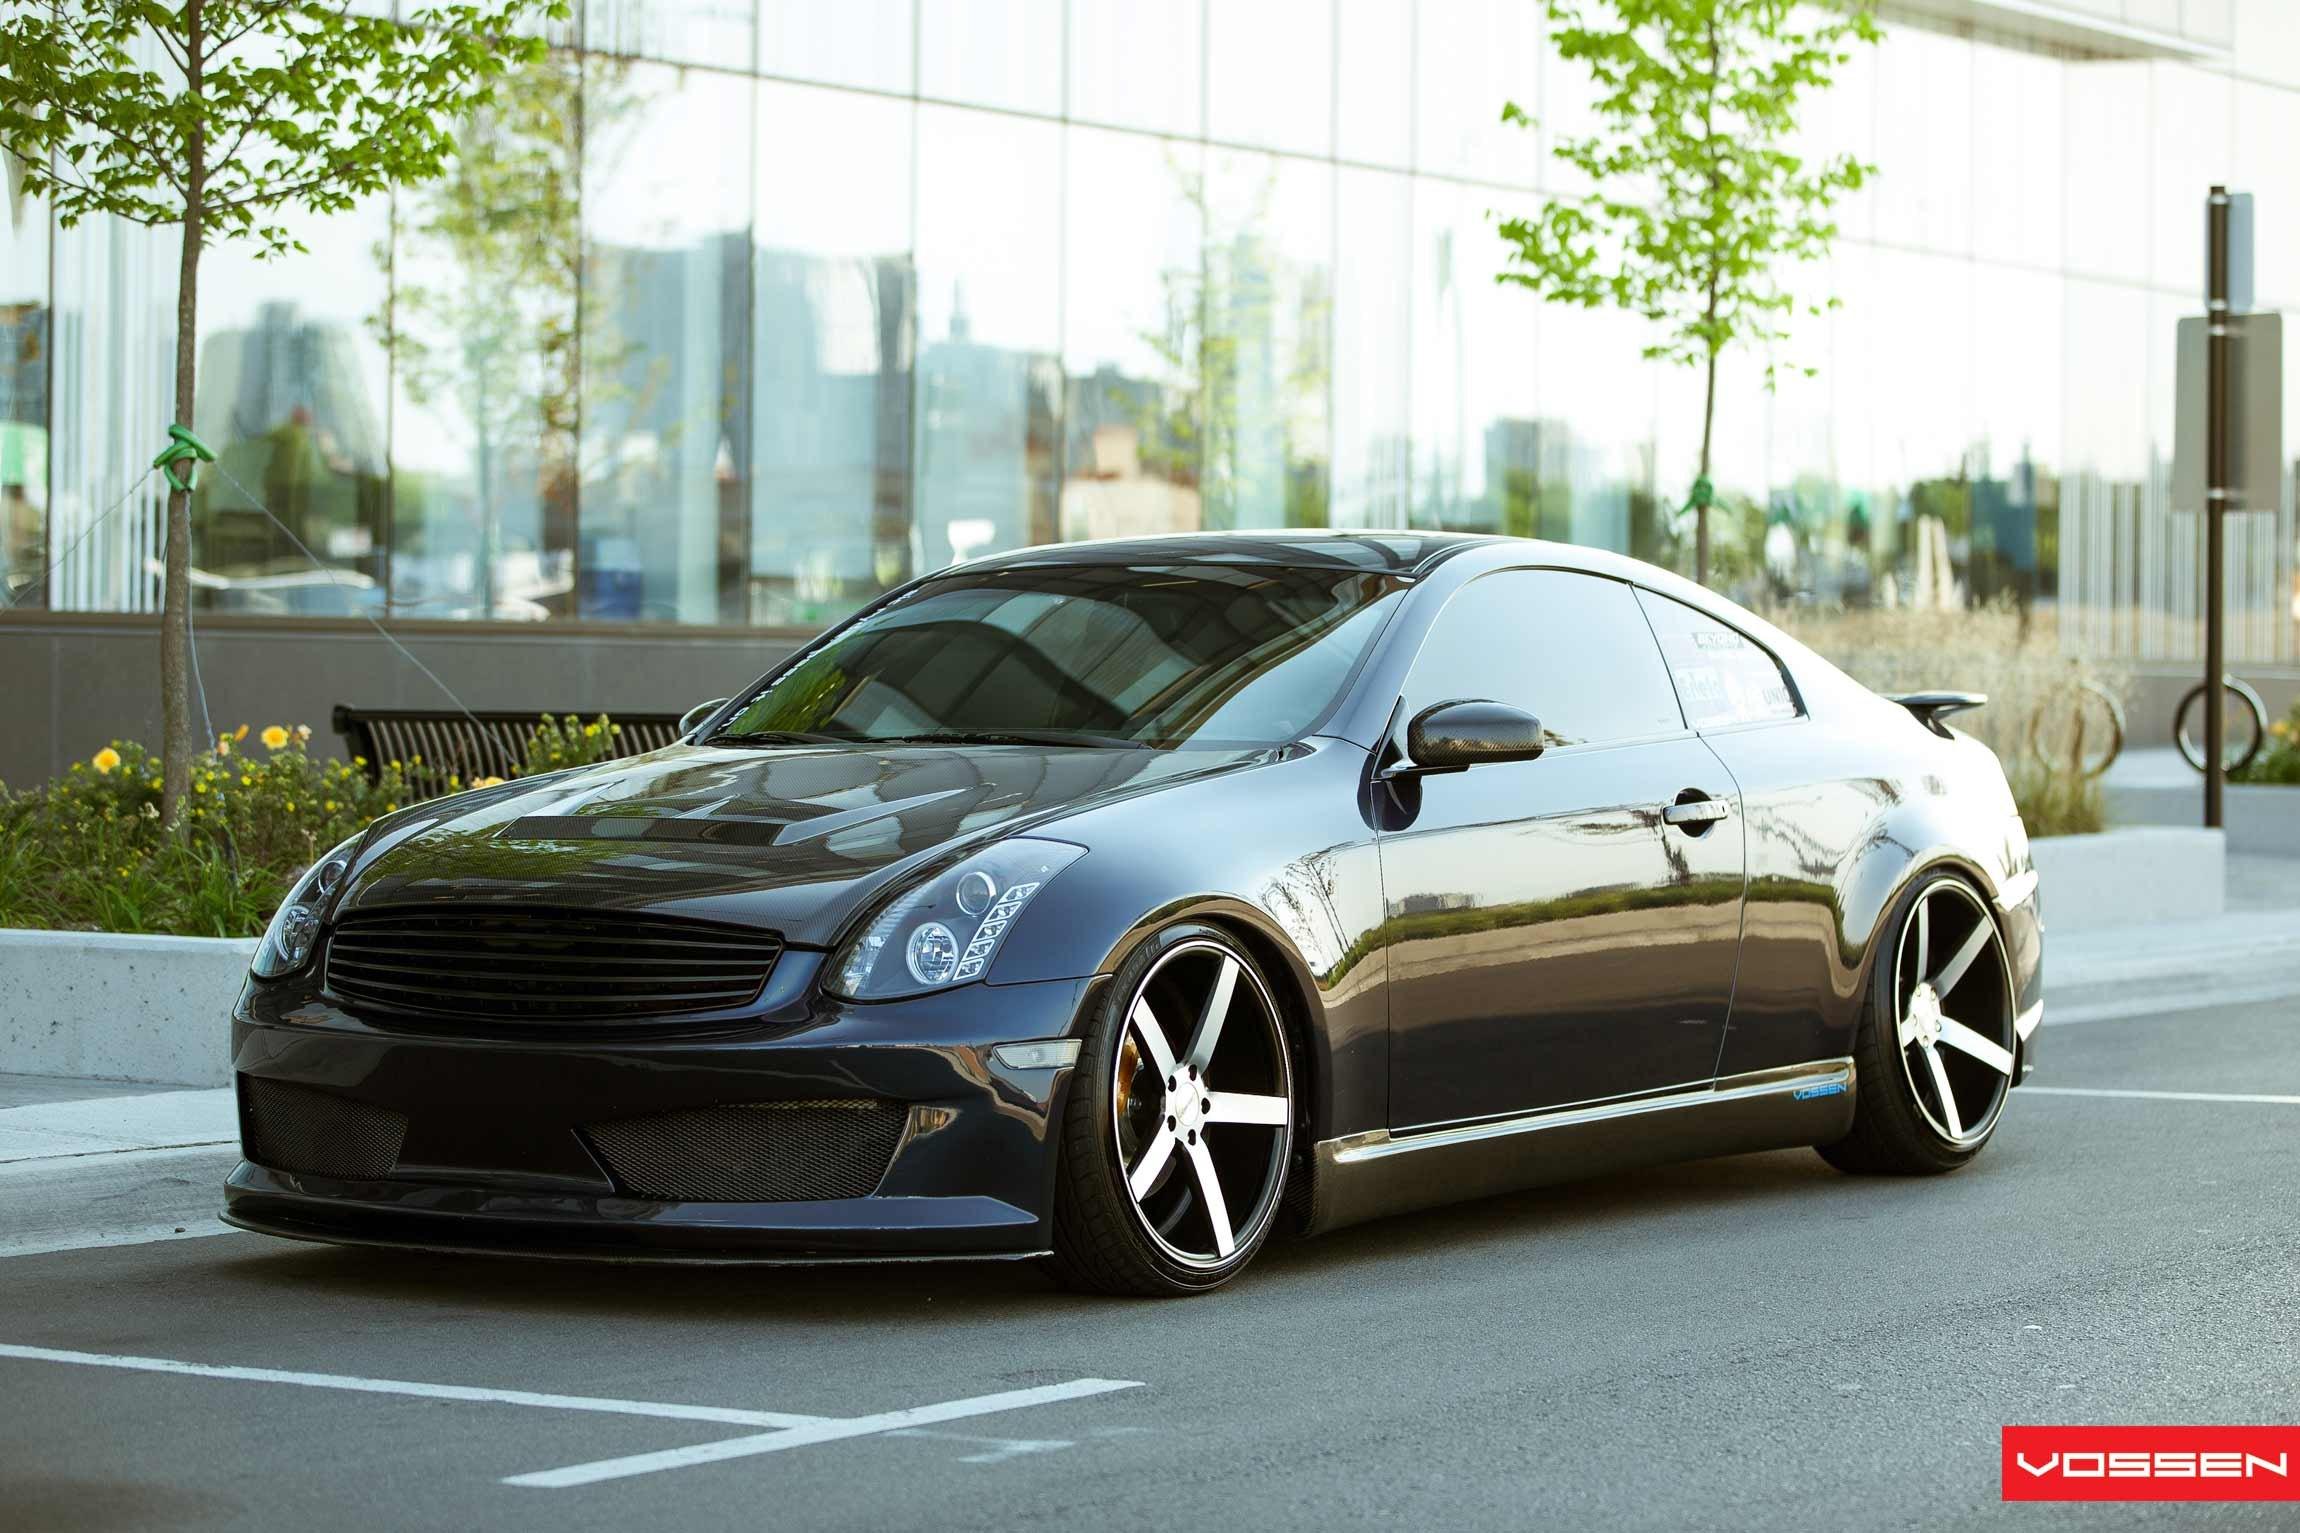 Infiniti G35 Custom >> Black Infiniti G35 Gets Carbon Fiber Treatment And Vossen Wheels